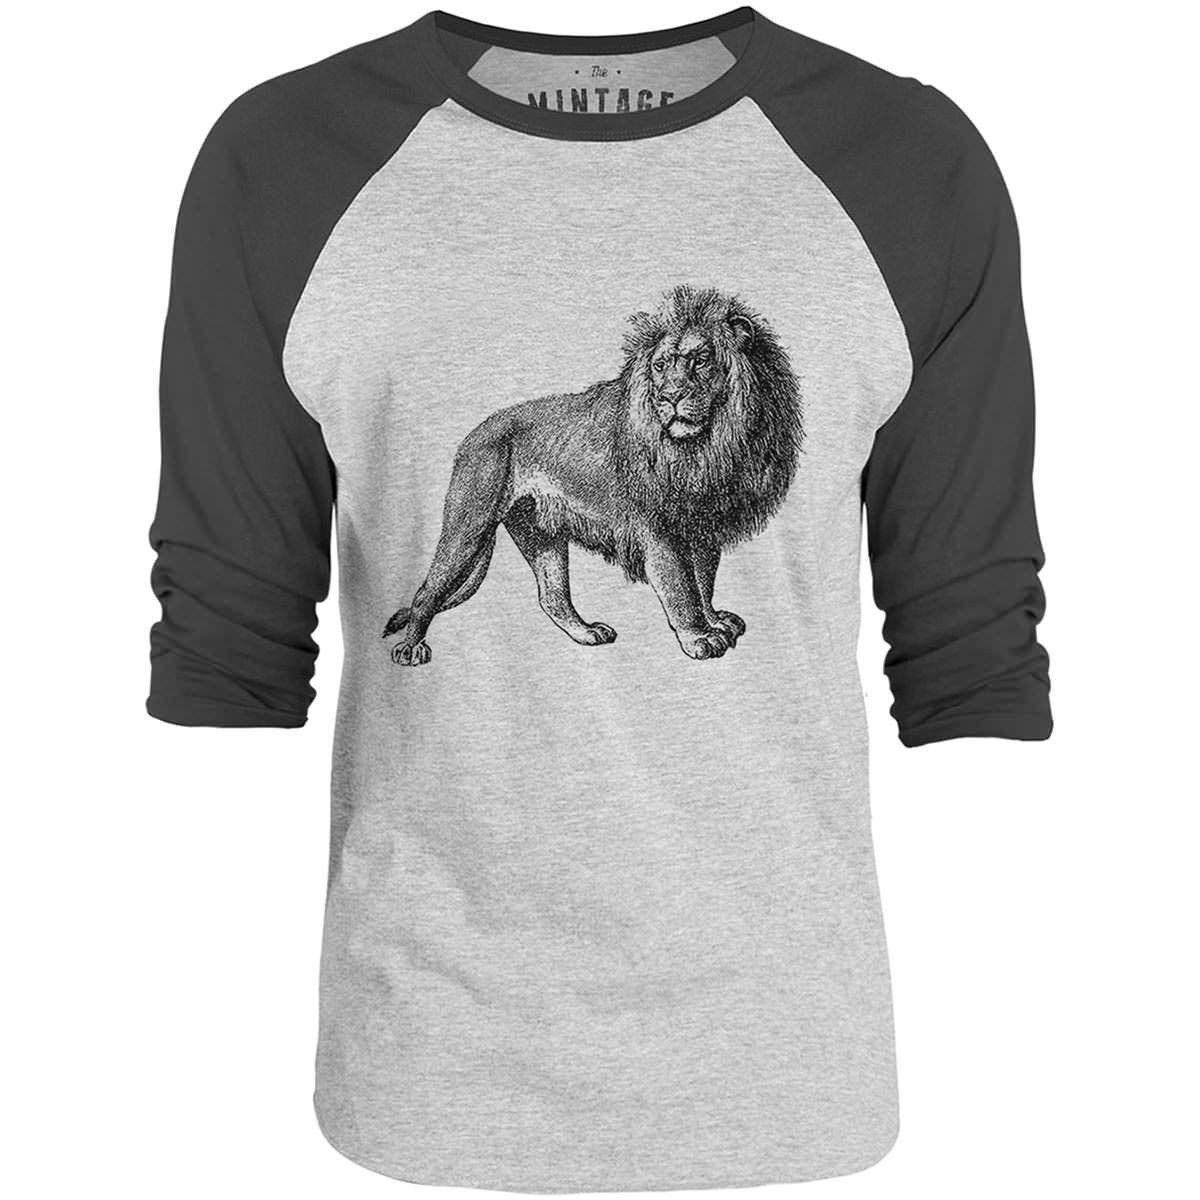 Mintage Majestic Lion 3/4-Sleeve Raglan Baseball T-Shirt (Grey Marle / Charcoal)